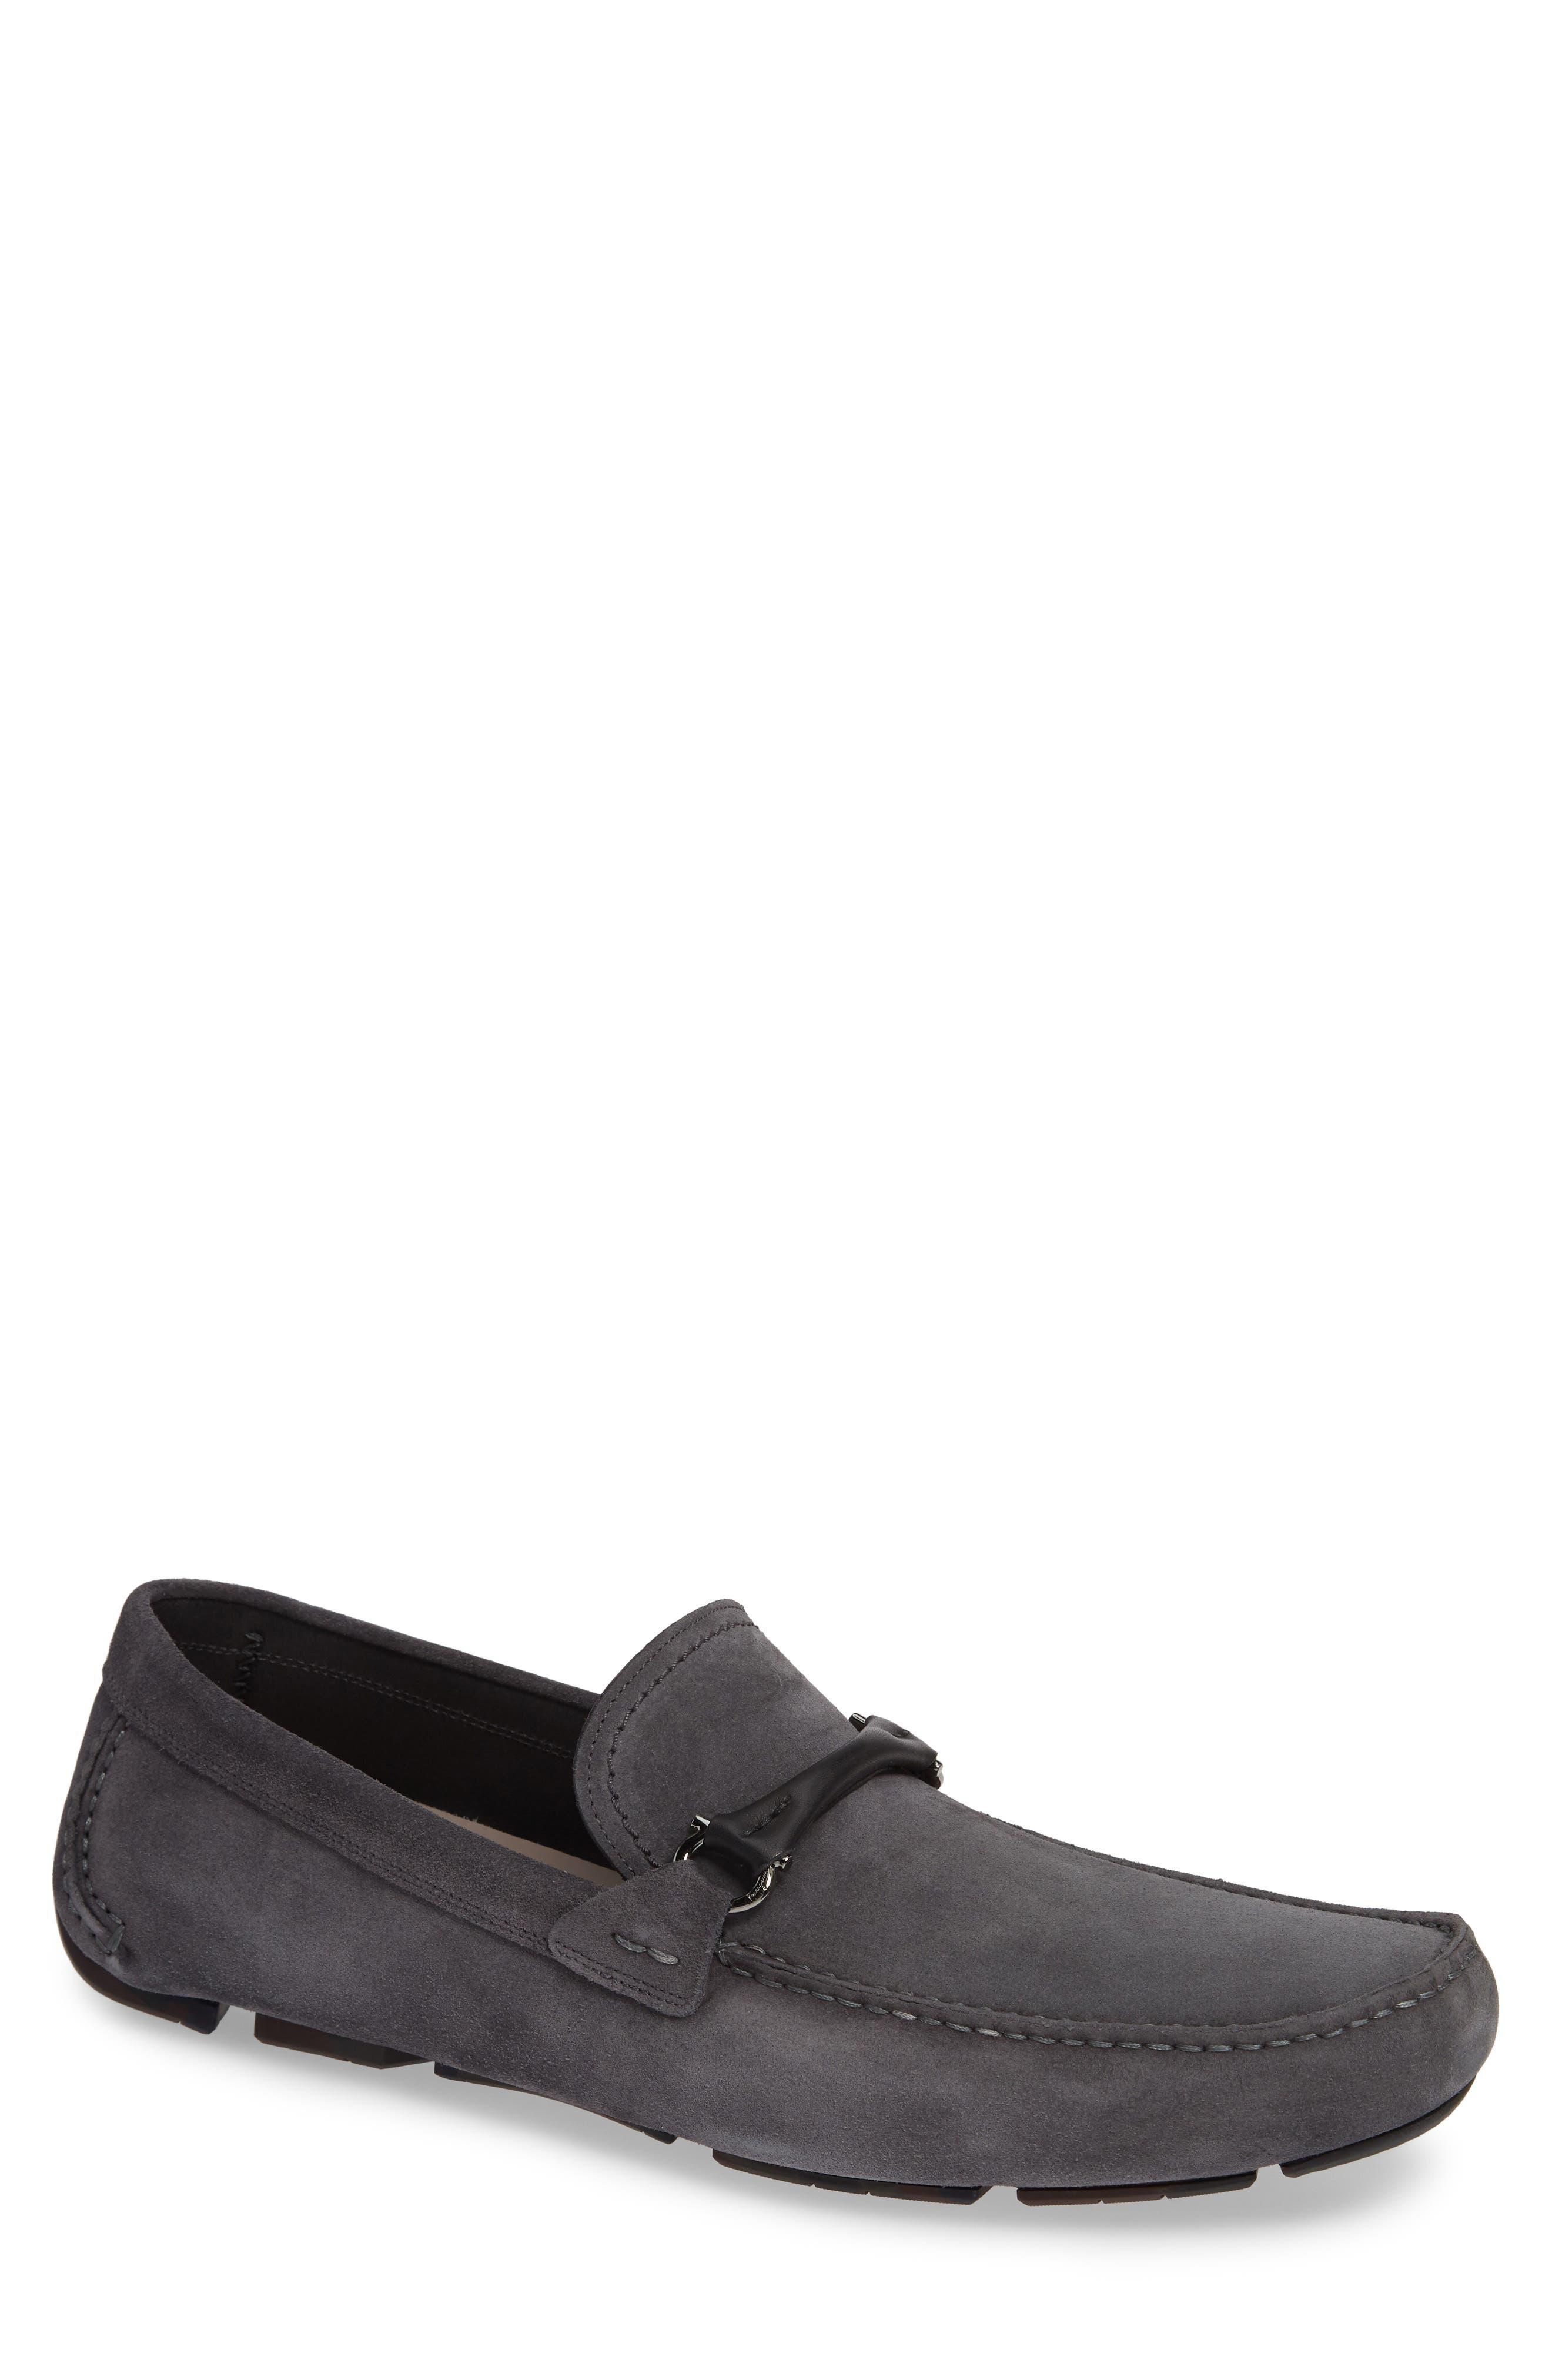 SALVATORE FERRAGAMO GranprixDriving Shoe, Main, color, AMALFI SUEDE